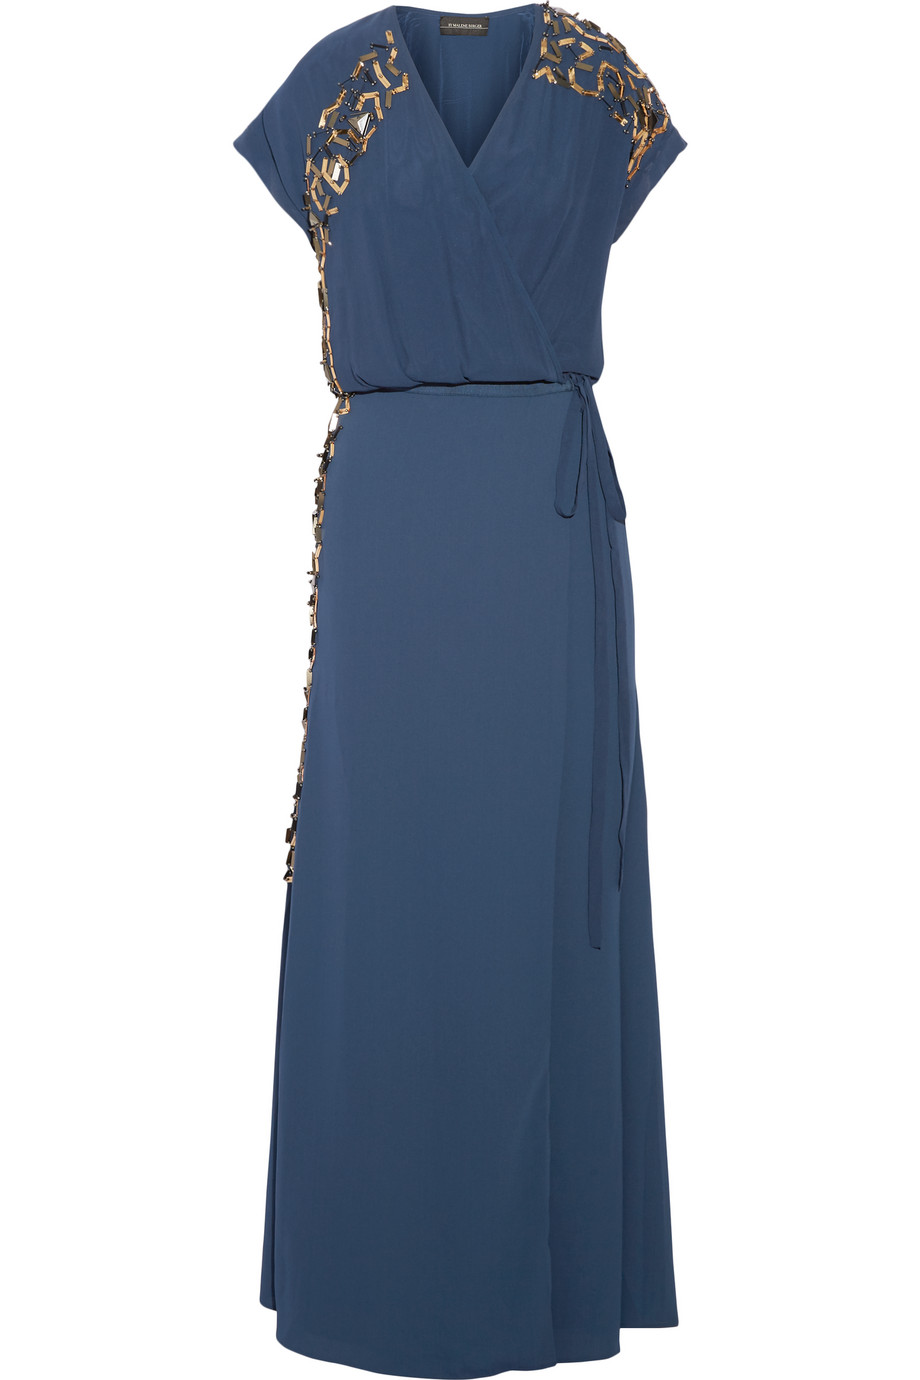 Wynona Embellished Crepe Wrap Maxi Dress, By Malene Birger, Storm Blue, Women's - Metallic, Size: 32